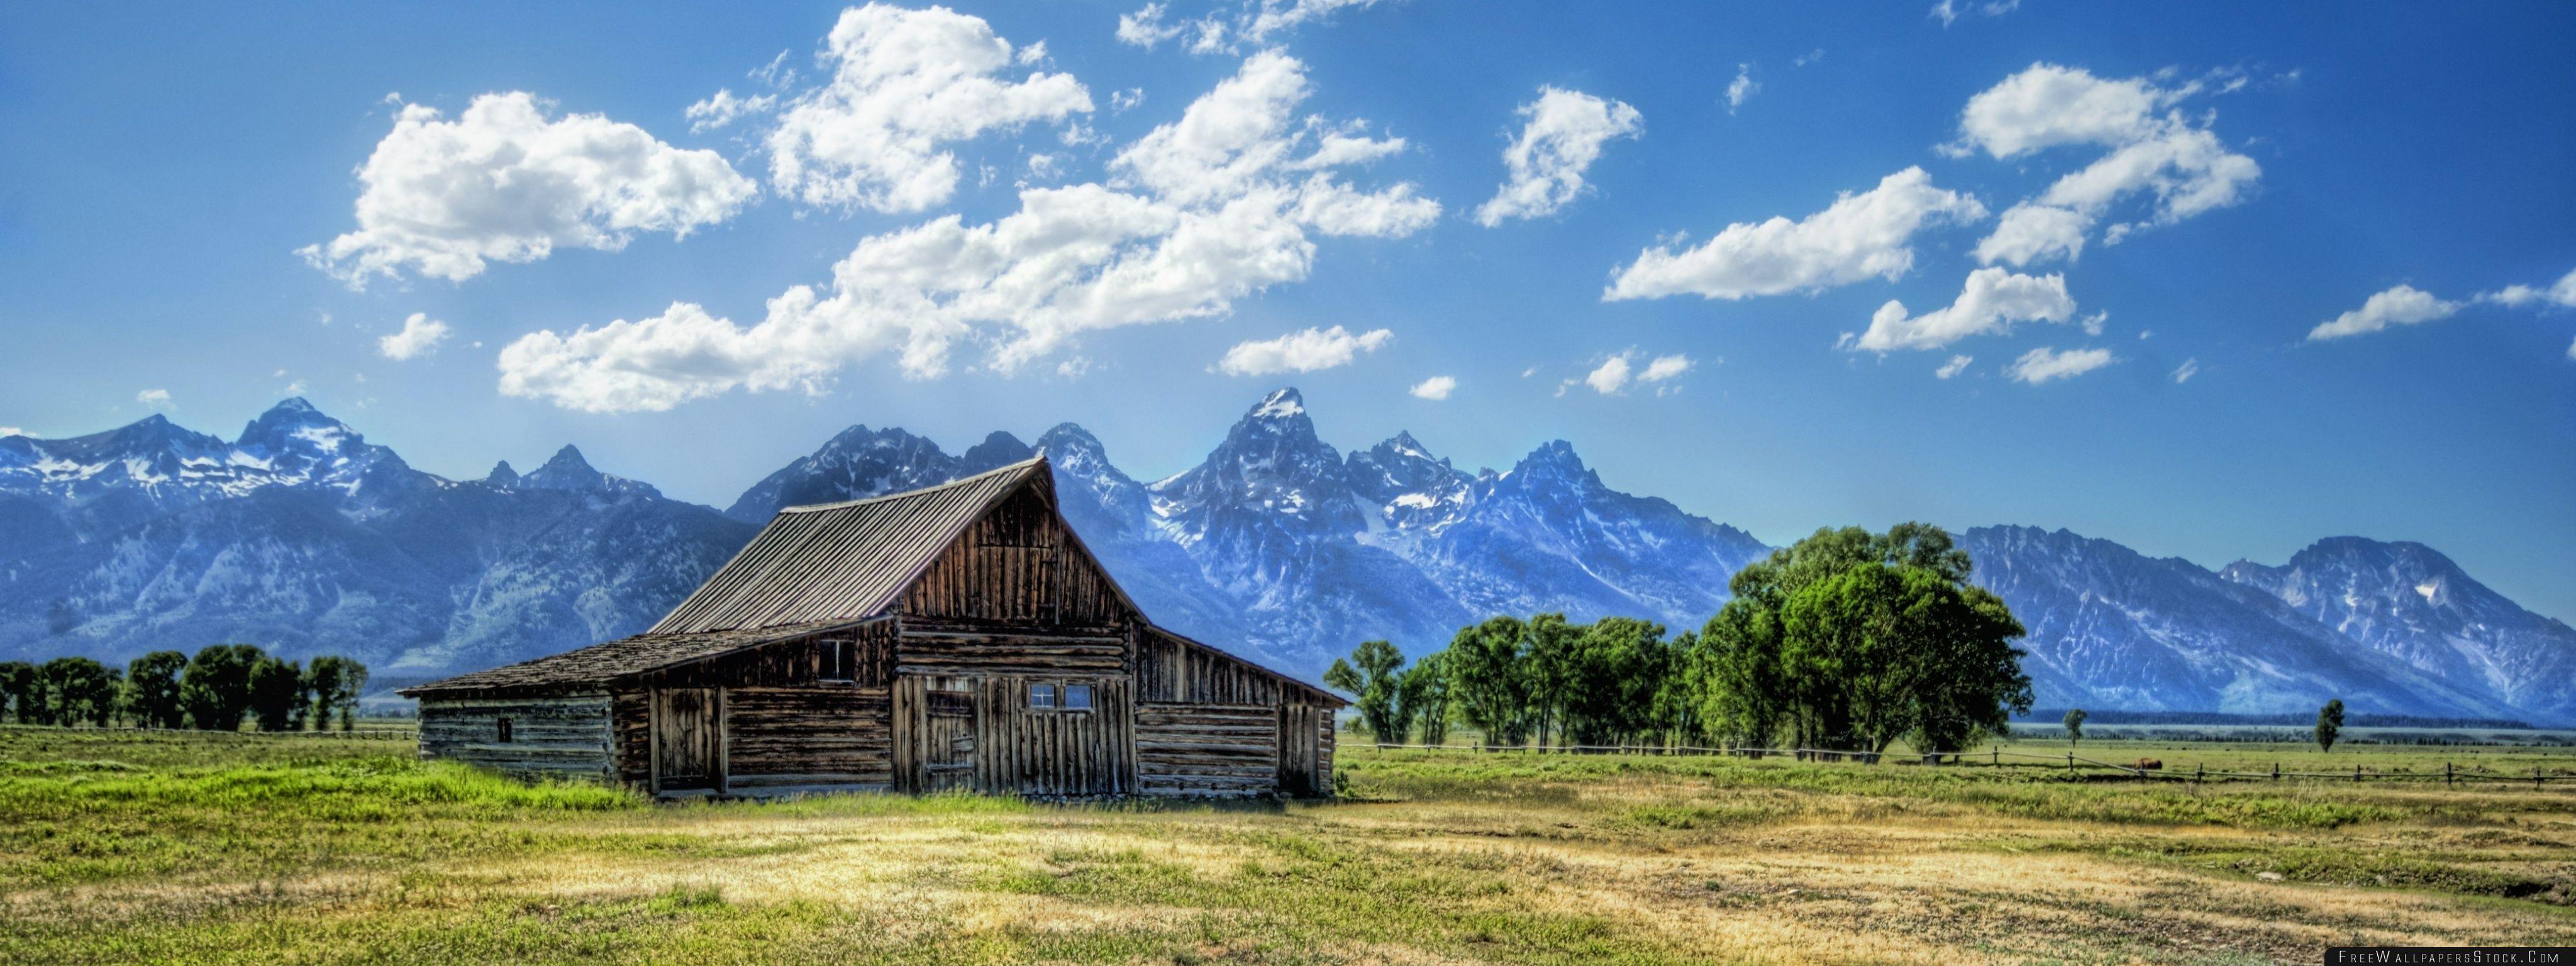 Download Free Wallpaper Wyoming Landscape